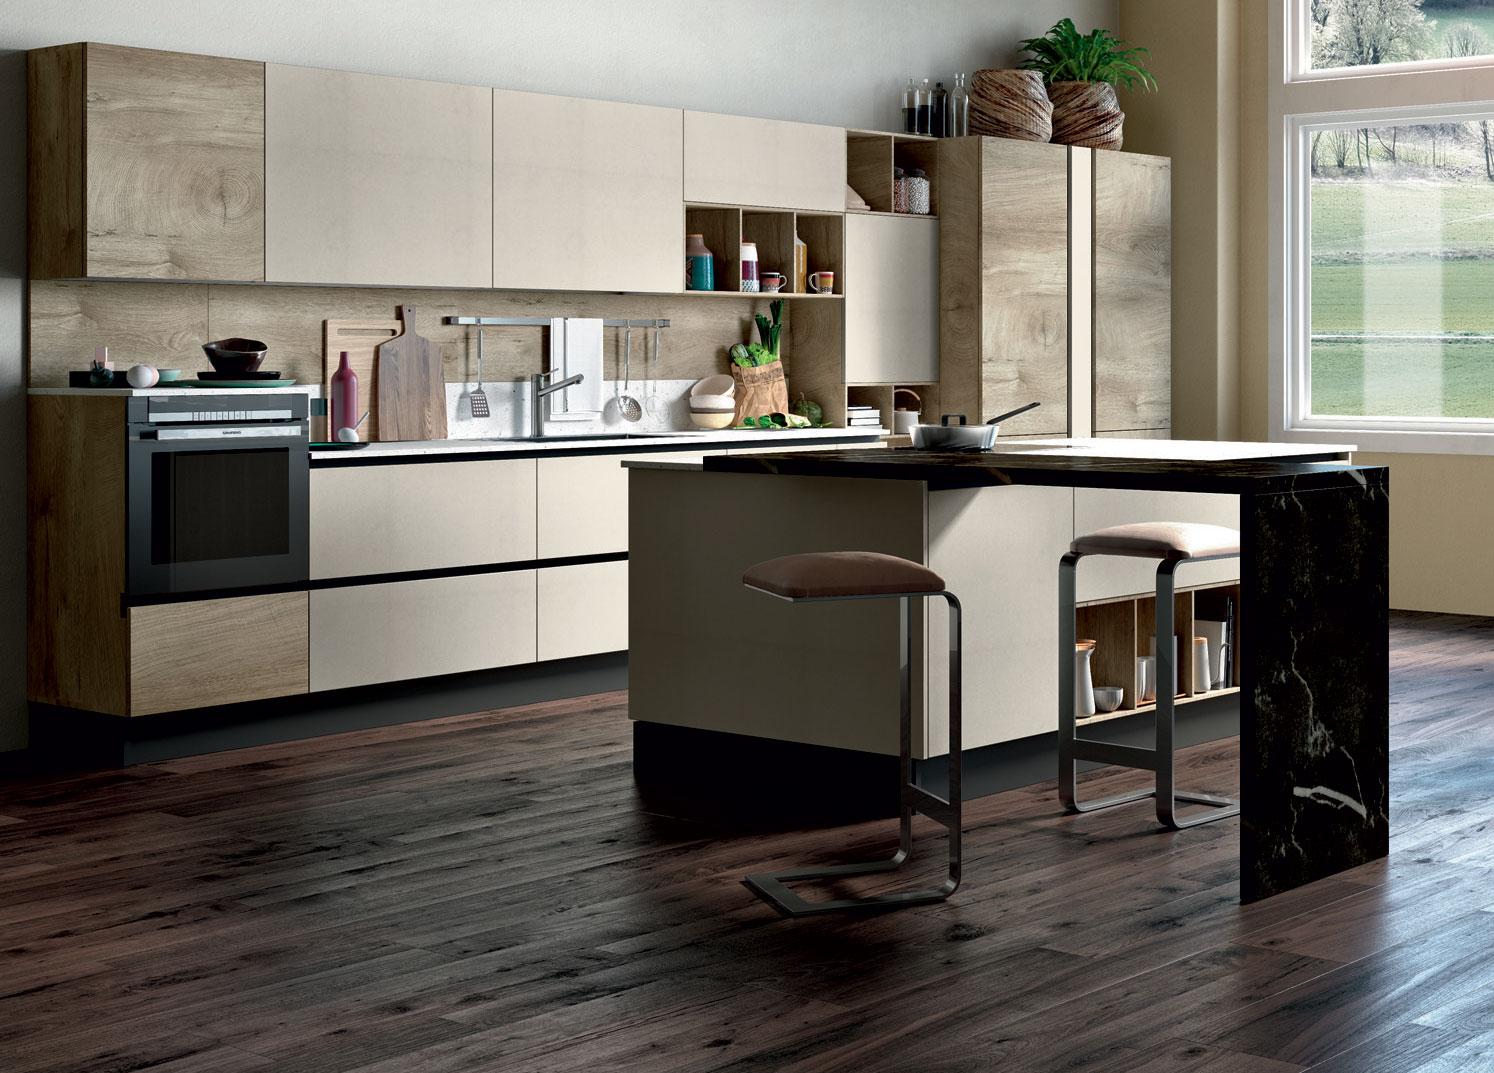 Cucine moderne: le tre finiture di tendenza nel 2018 - Pensarecasa